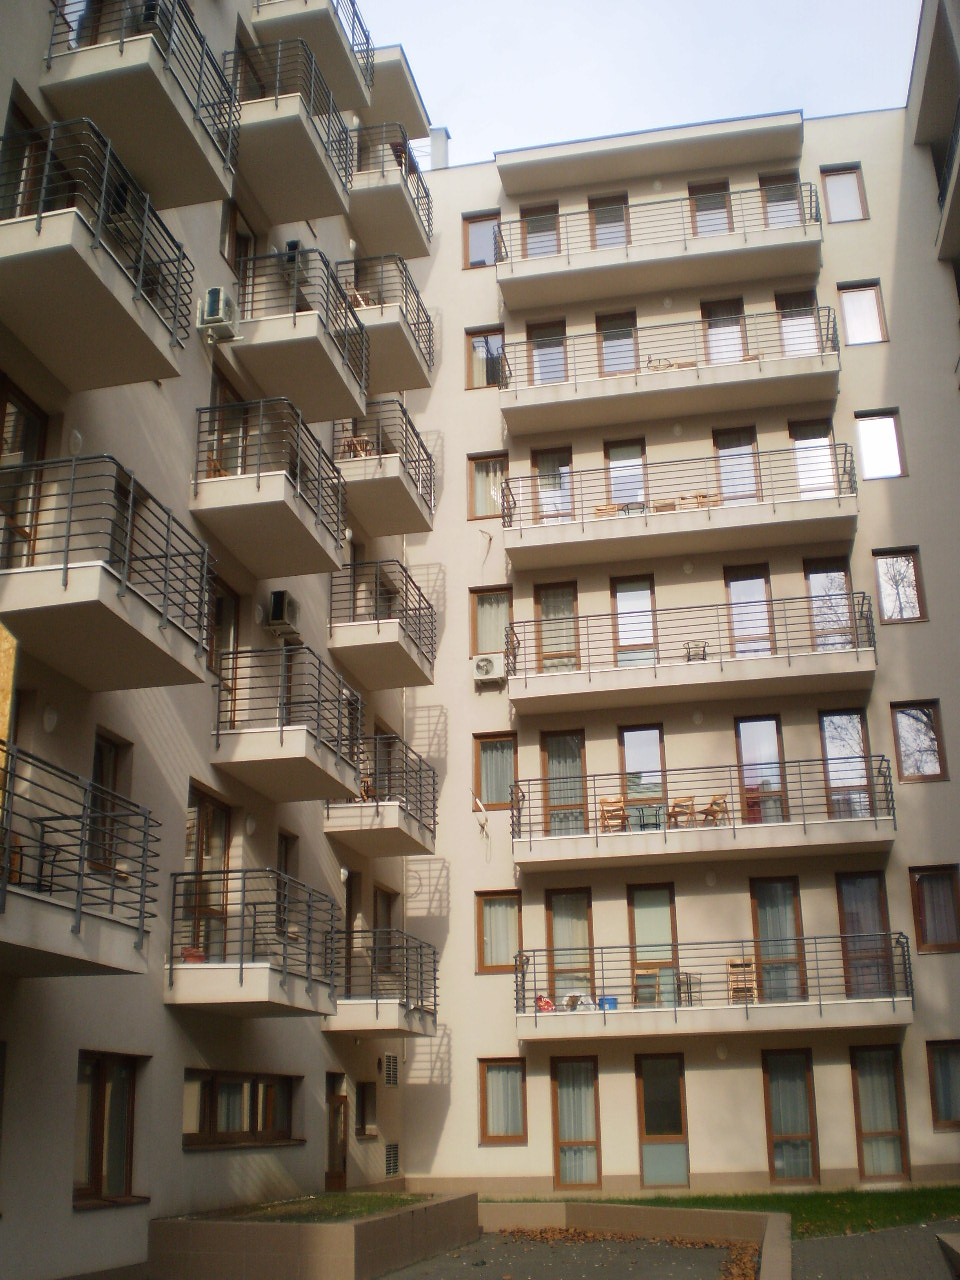 VIII. Kisfaludy Str. 18-20. Apartment 607